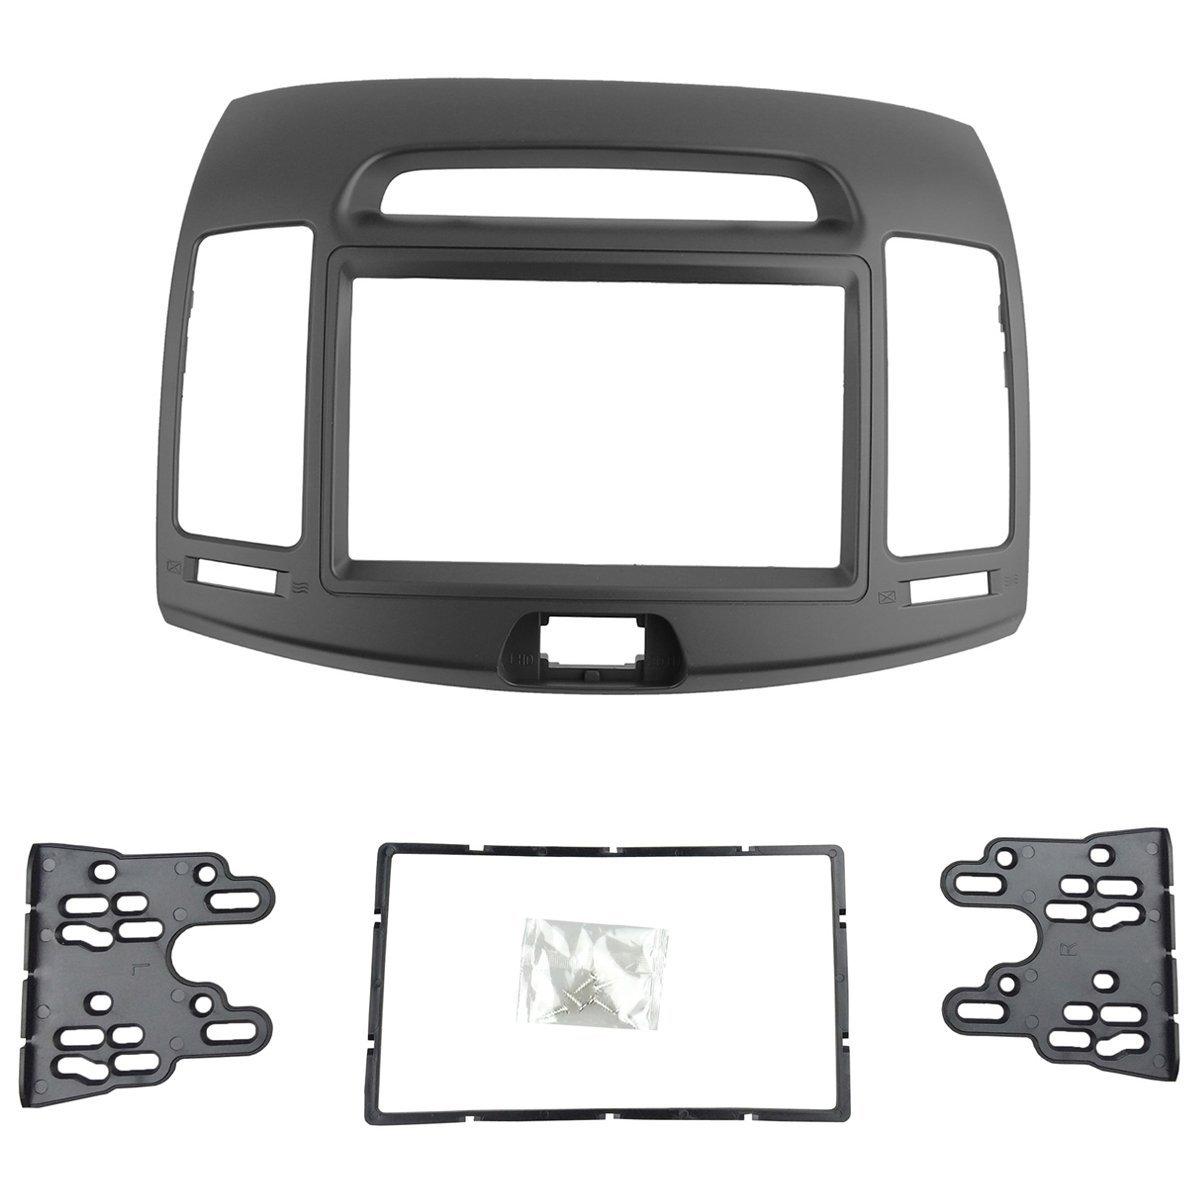 DKMUS Car Stereo Dash Radio Fascia Kit For 2006-2010 Hyundai Elantra (HD), Avante (HD) 2006-2010 Installation Trim Panel Frame Double Din (Grey) by DKMUS